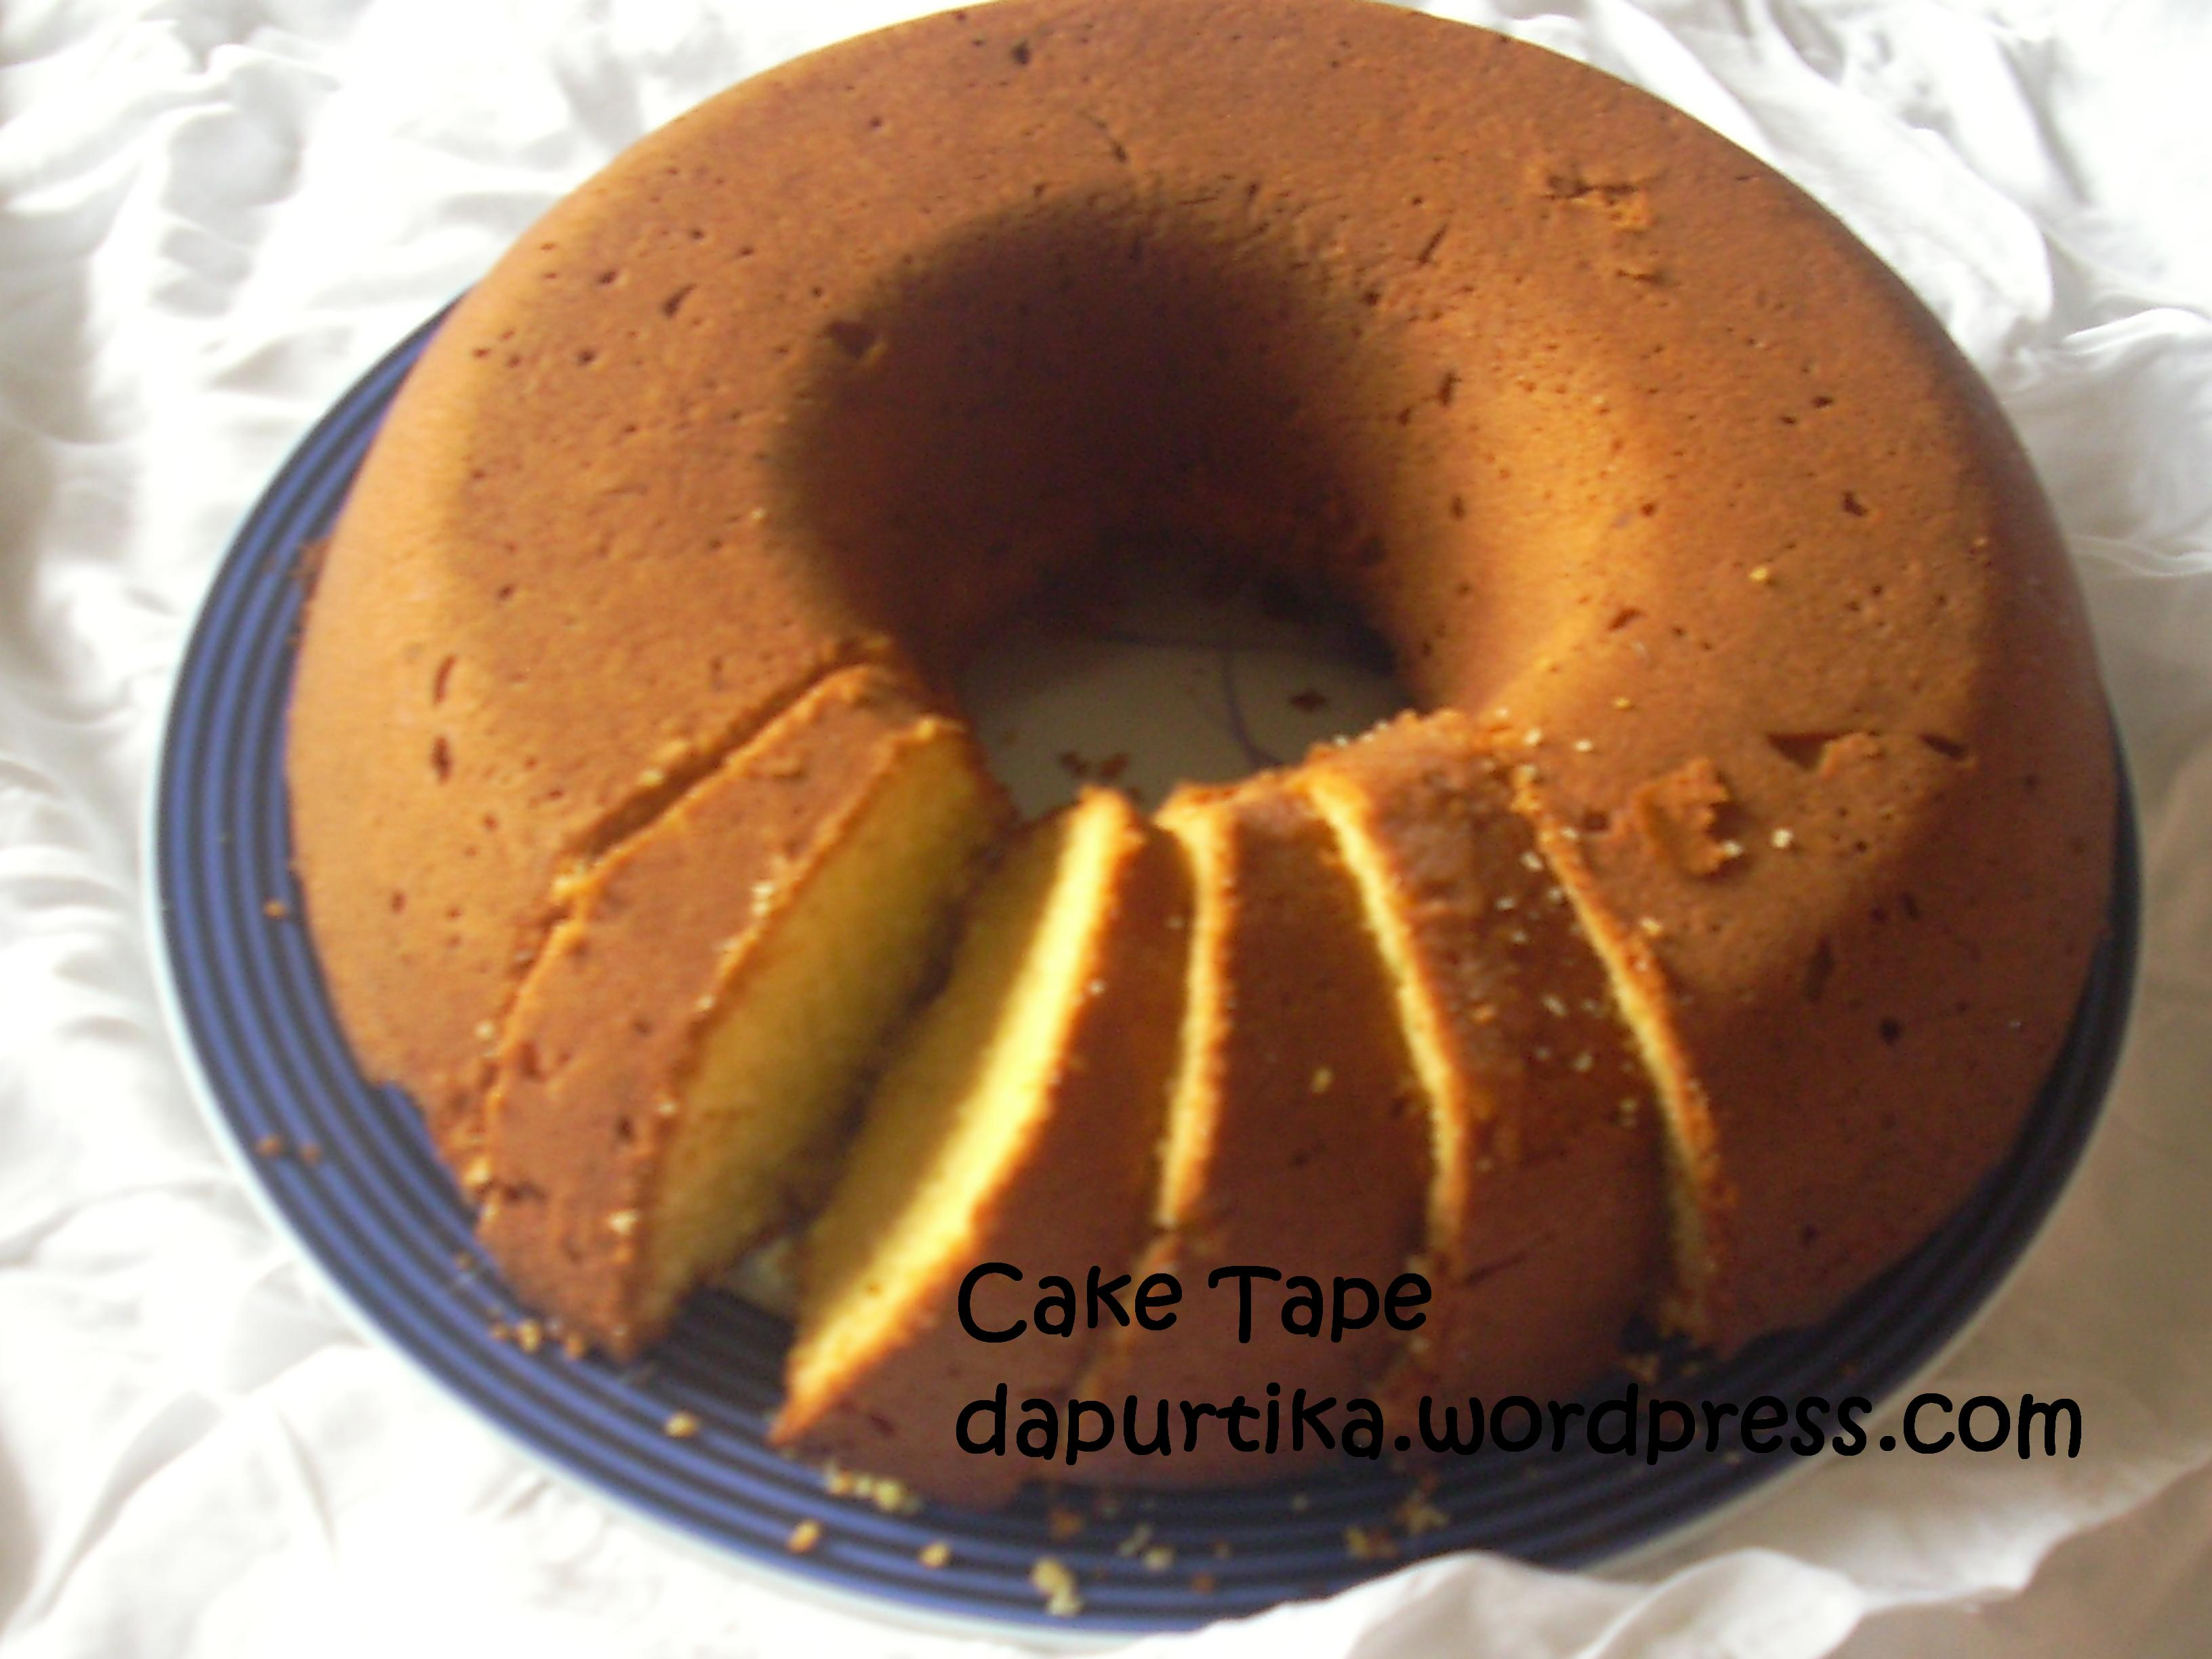 Resep Cake Tape Spesial Jtt: Dapurtika